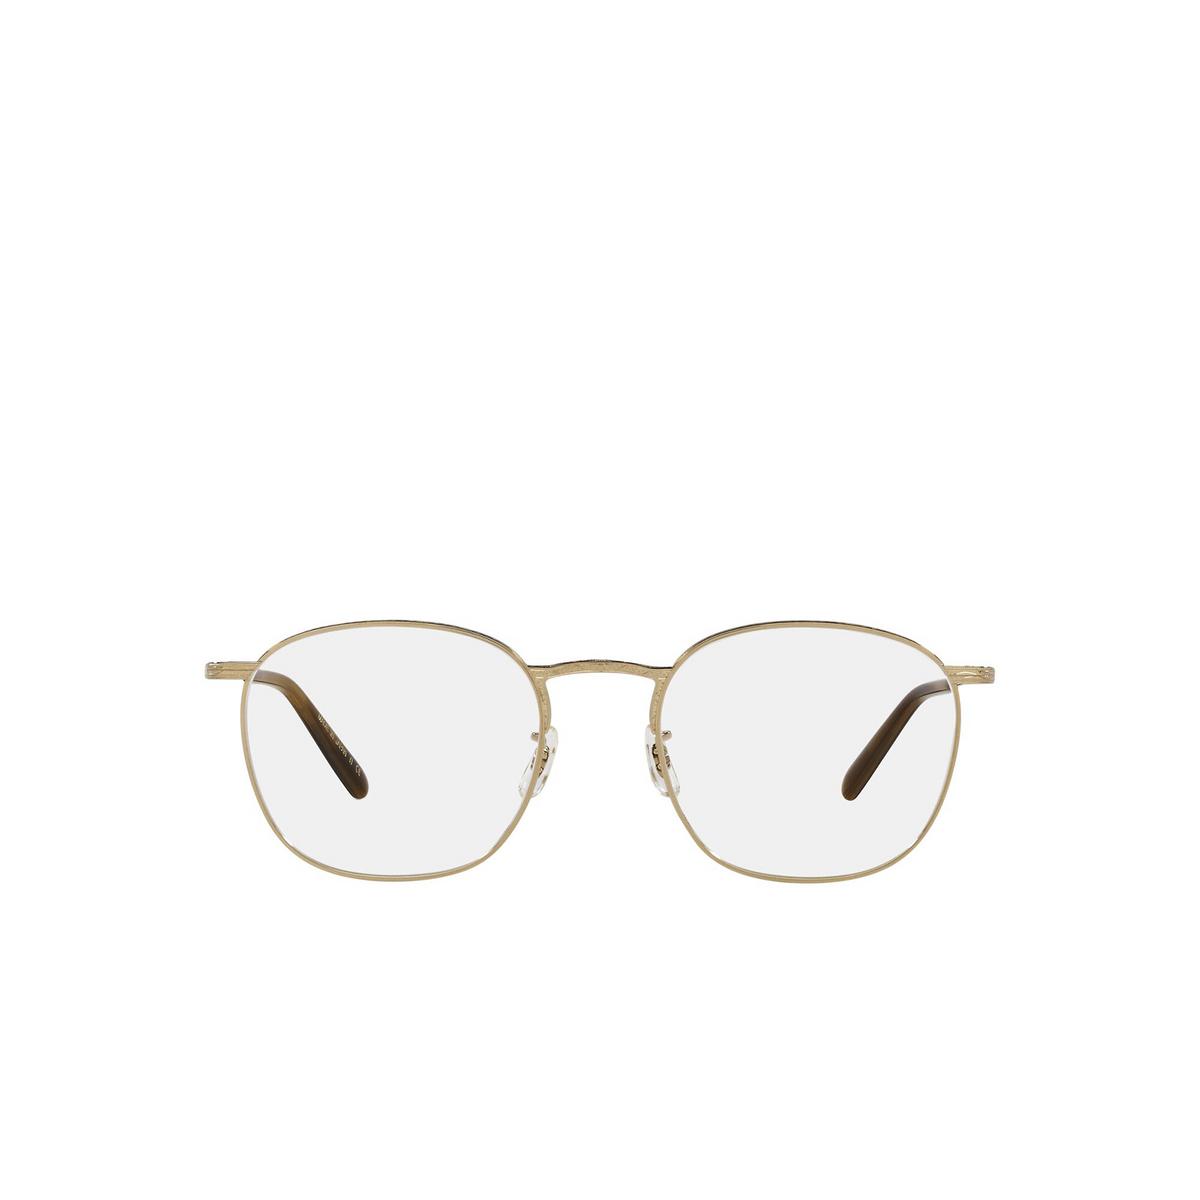 Oliver Peoples® Square Eyeglasses: Goldsen OV1285T color White Gold 5292 - front view.